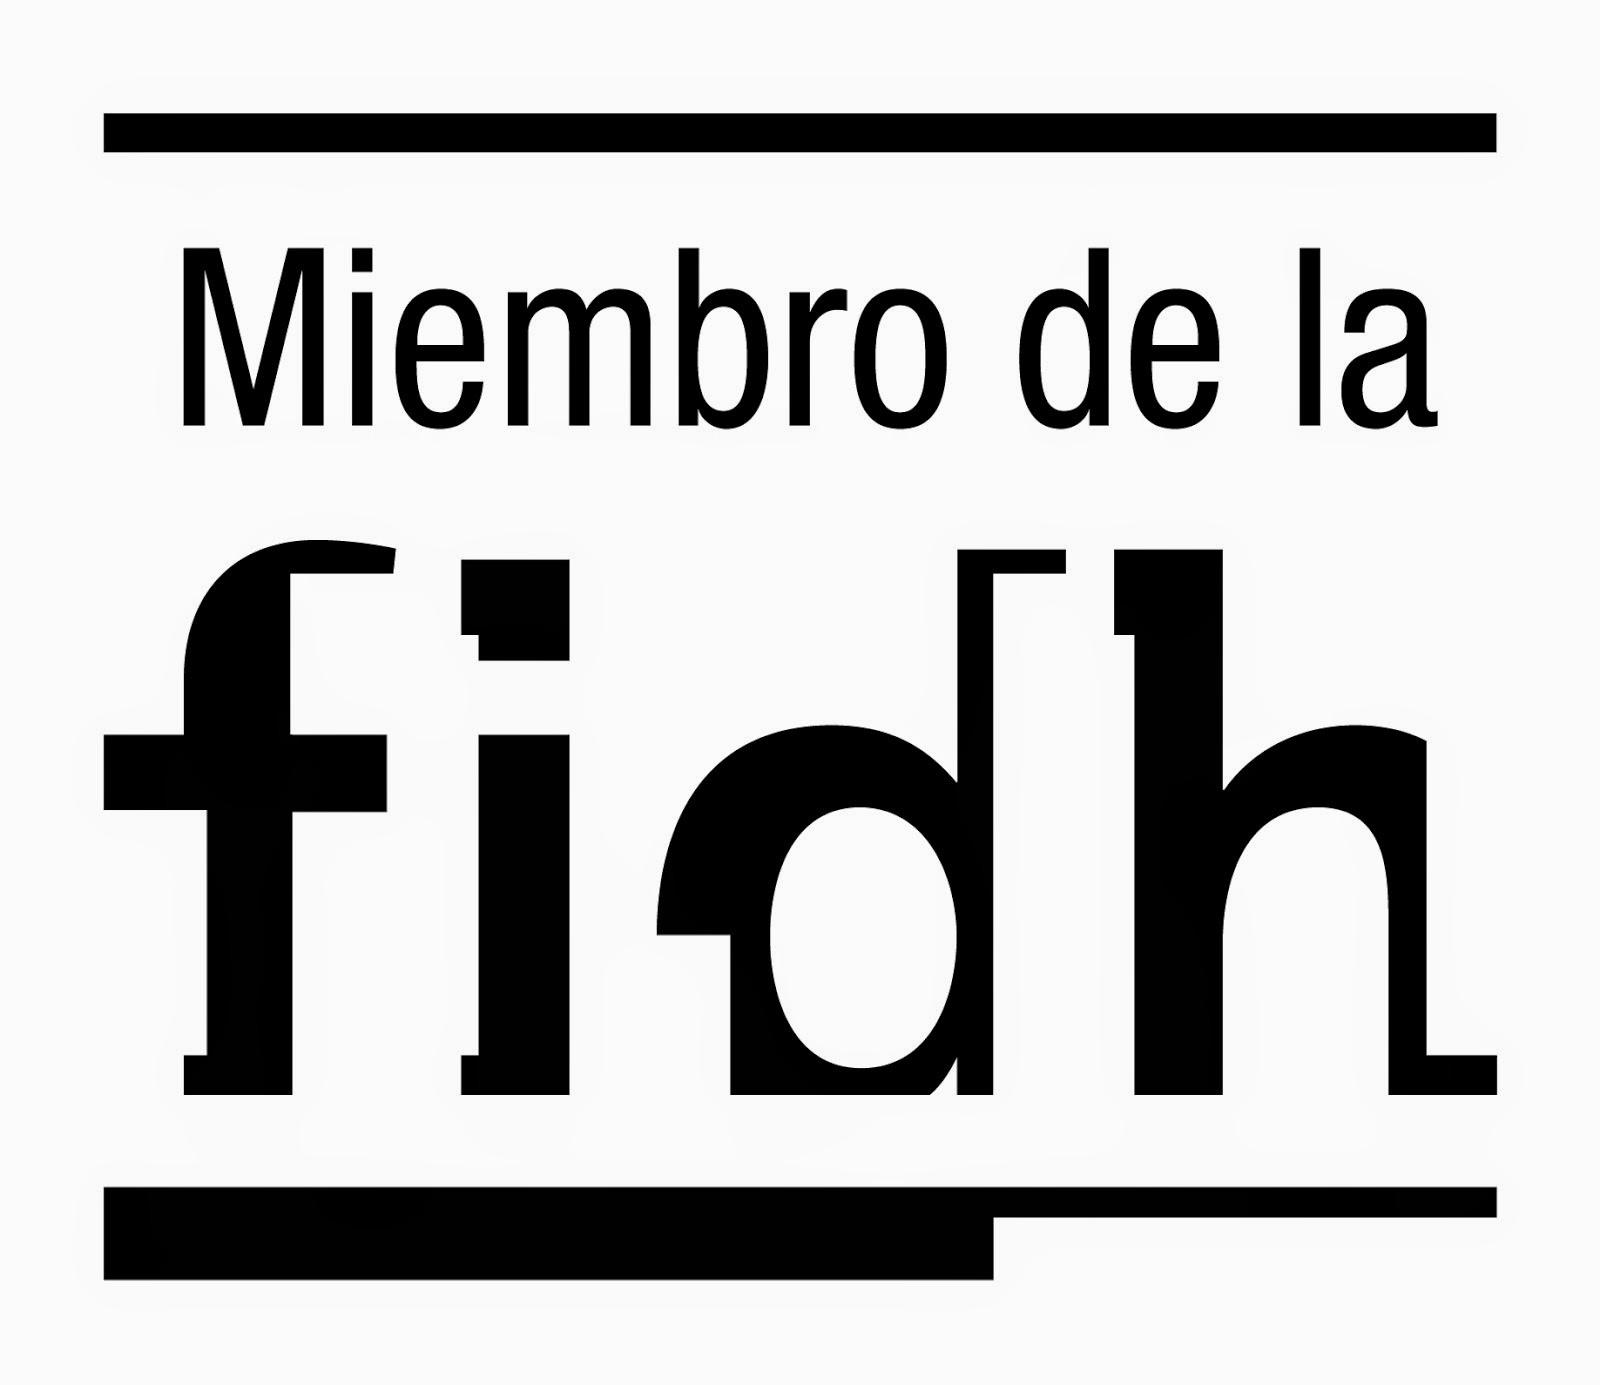 Miembro FIDH